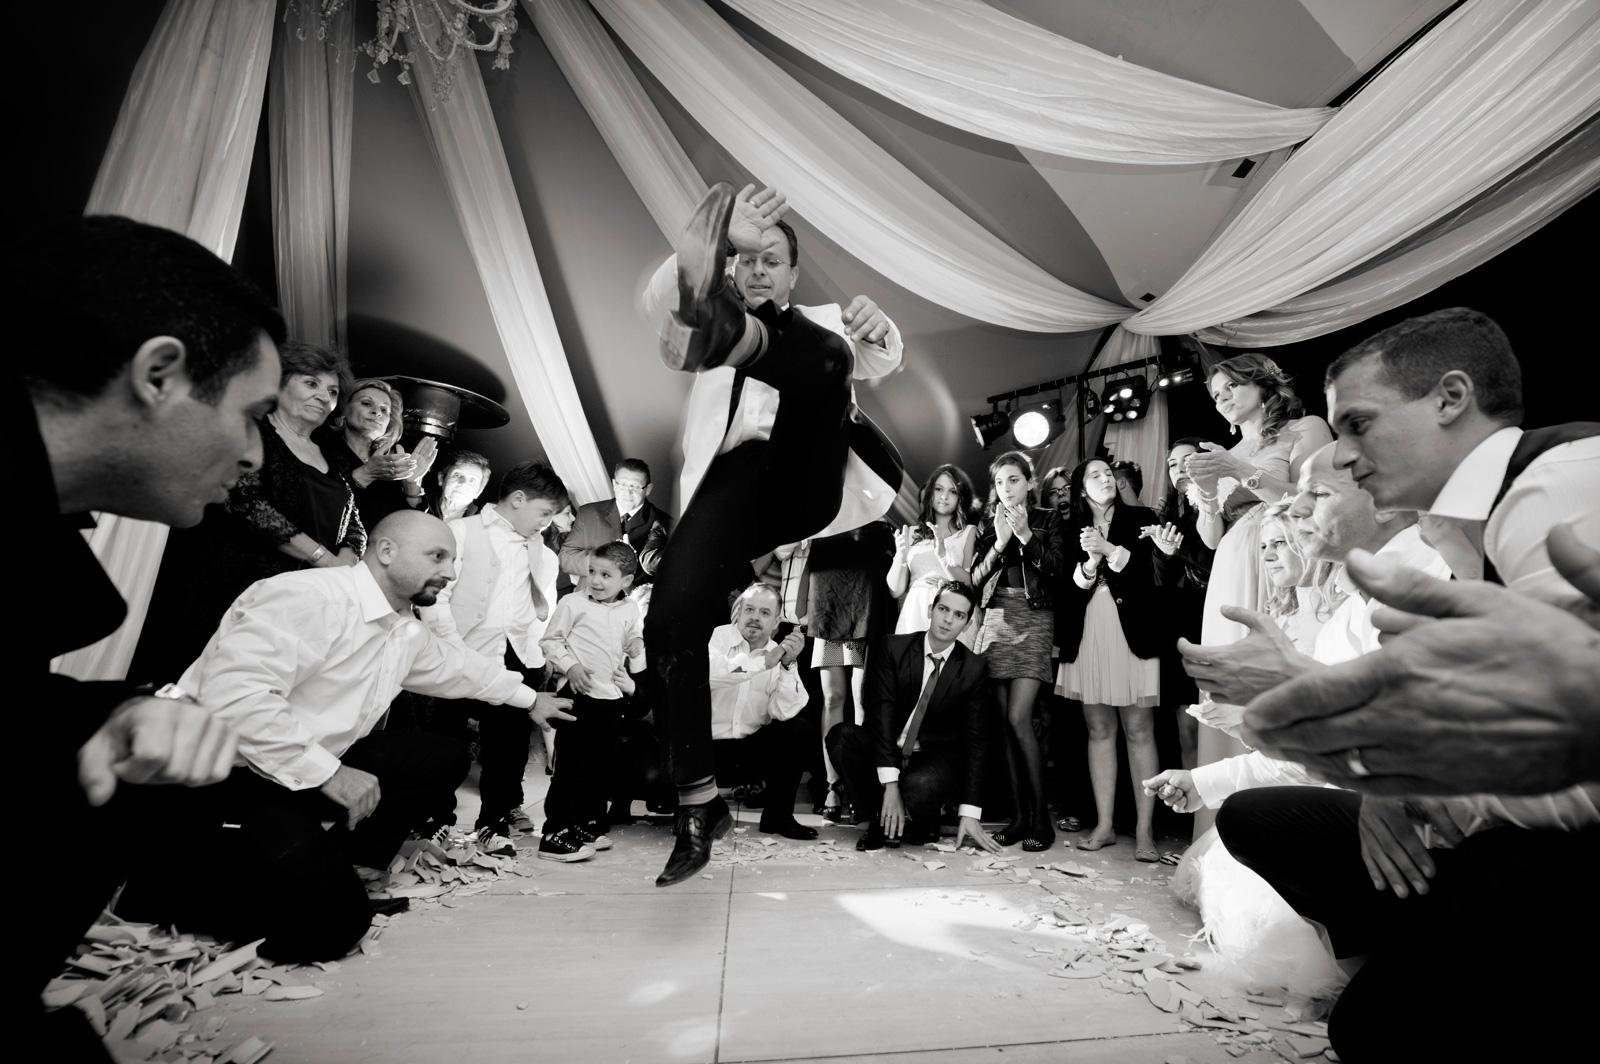 Greek wedding dancing